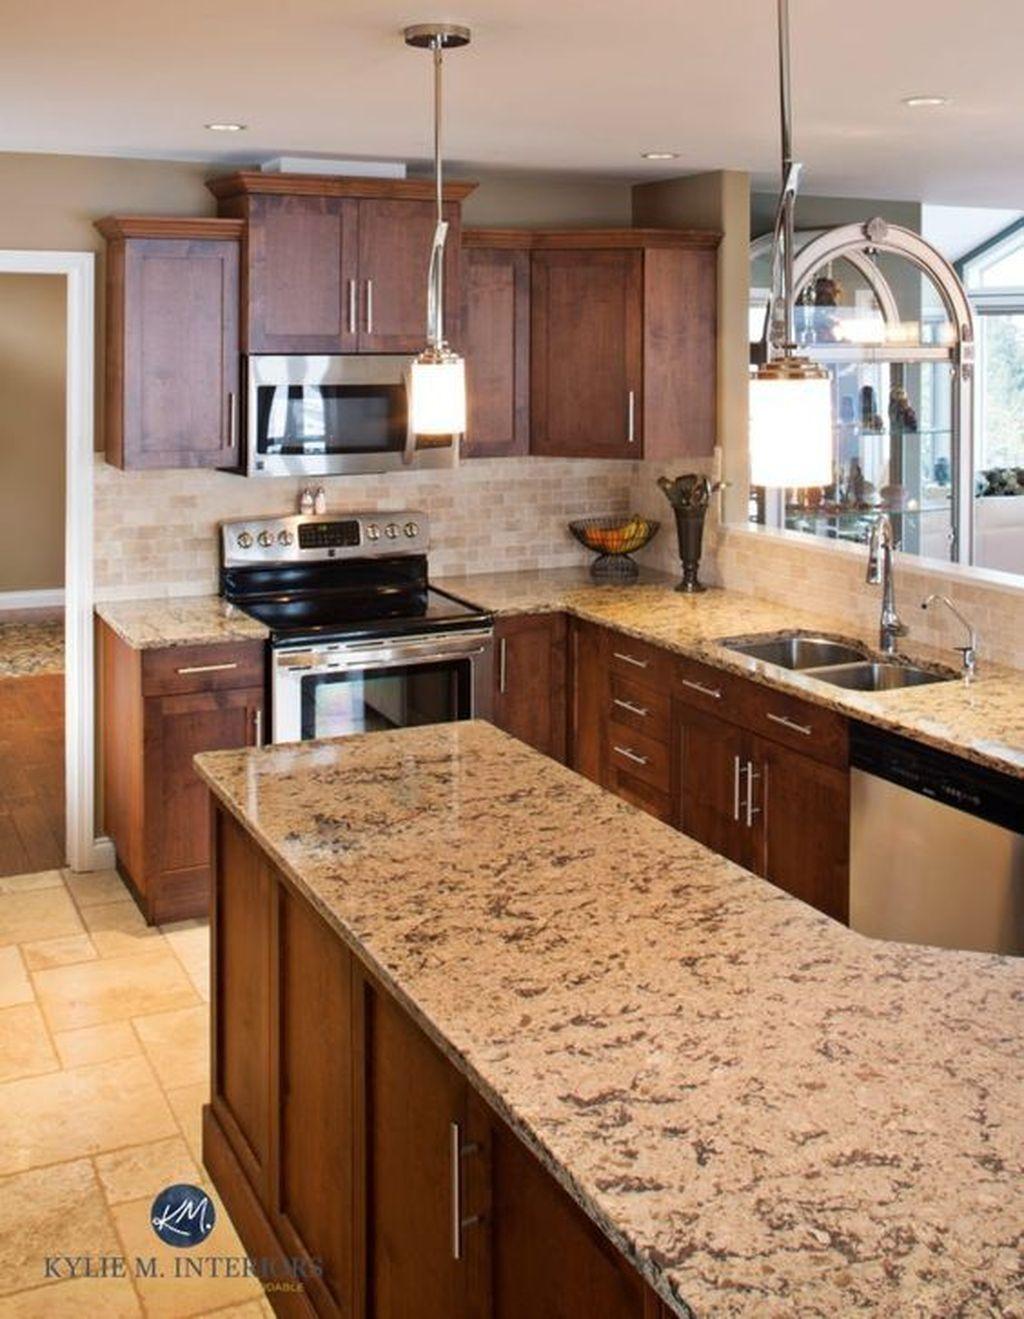 Awesome simple beautiful kitchen backsplash design ideas on a